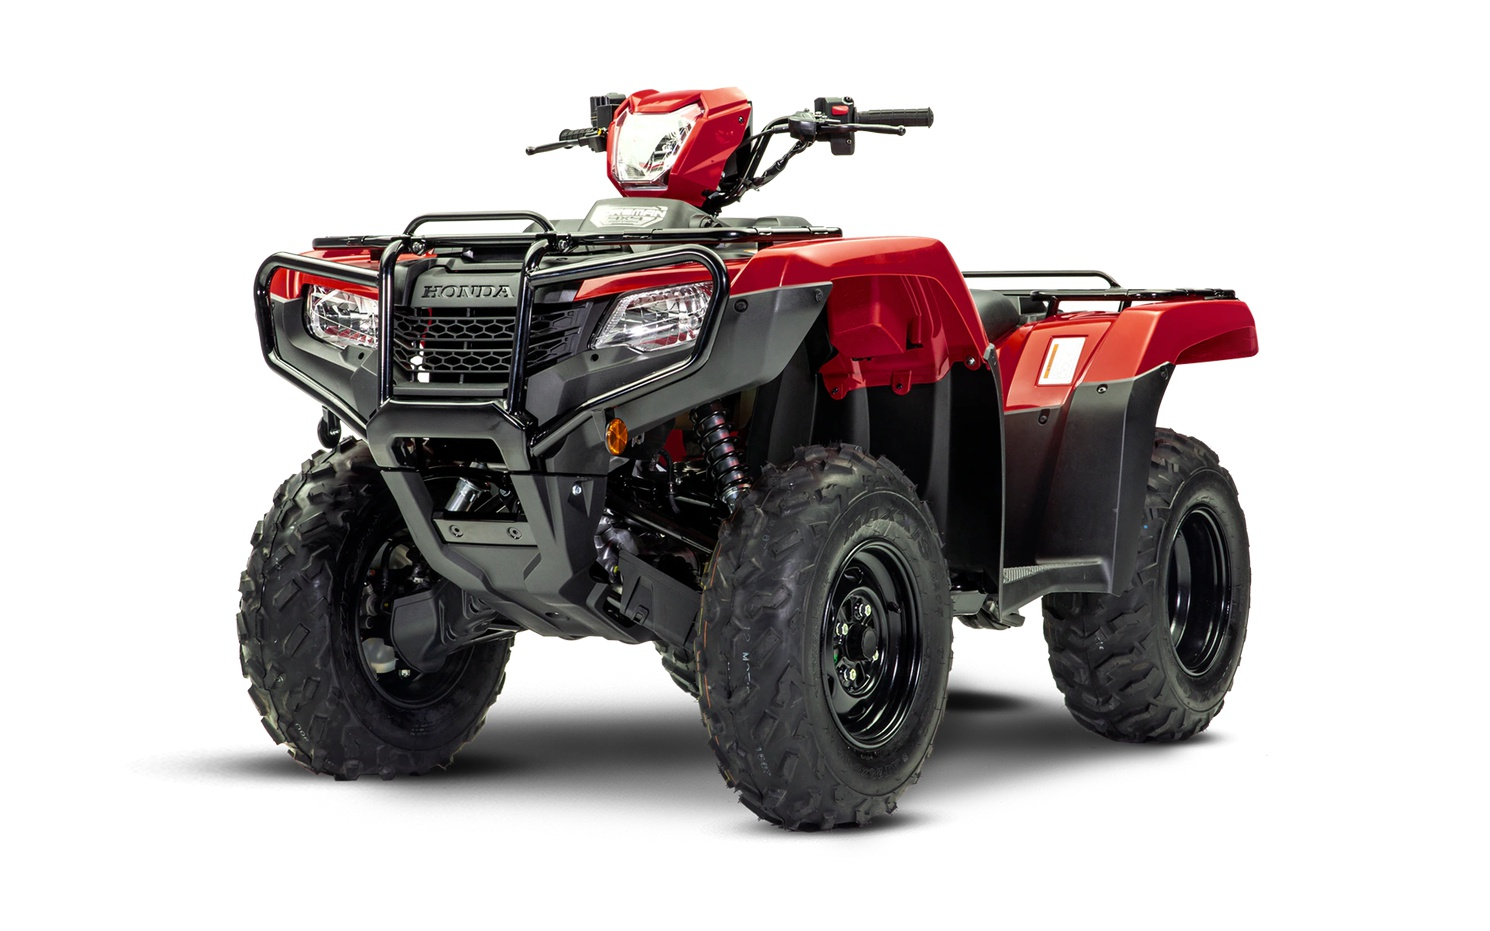 2022 Honda TRX520 Foreman Frais inclus+Taxes